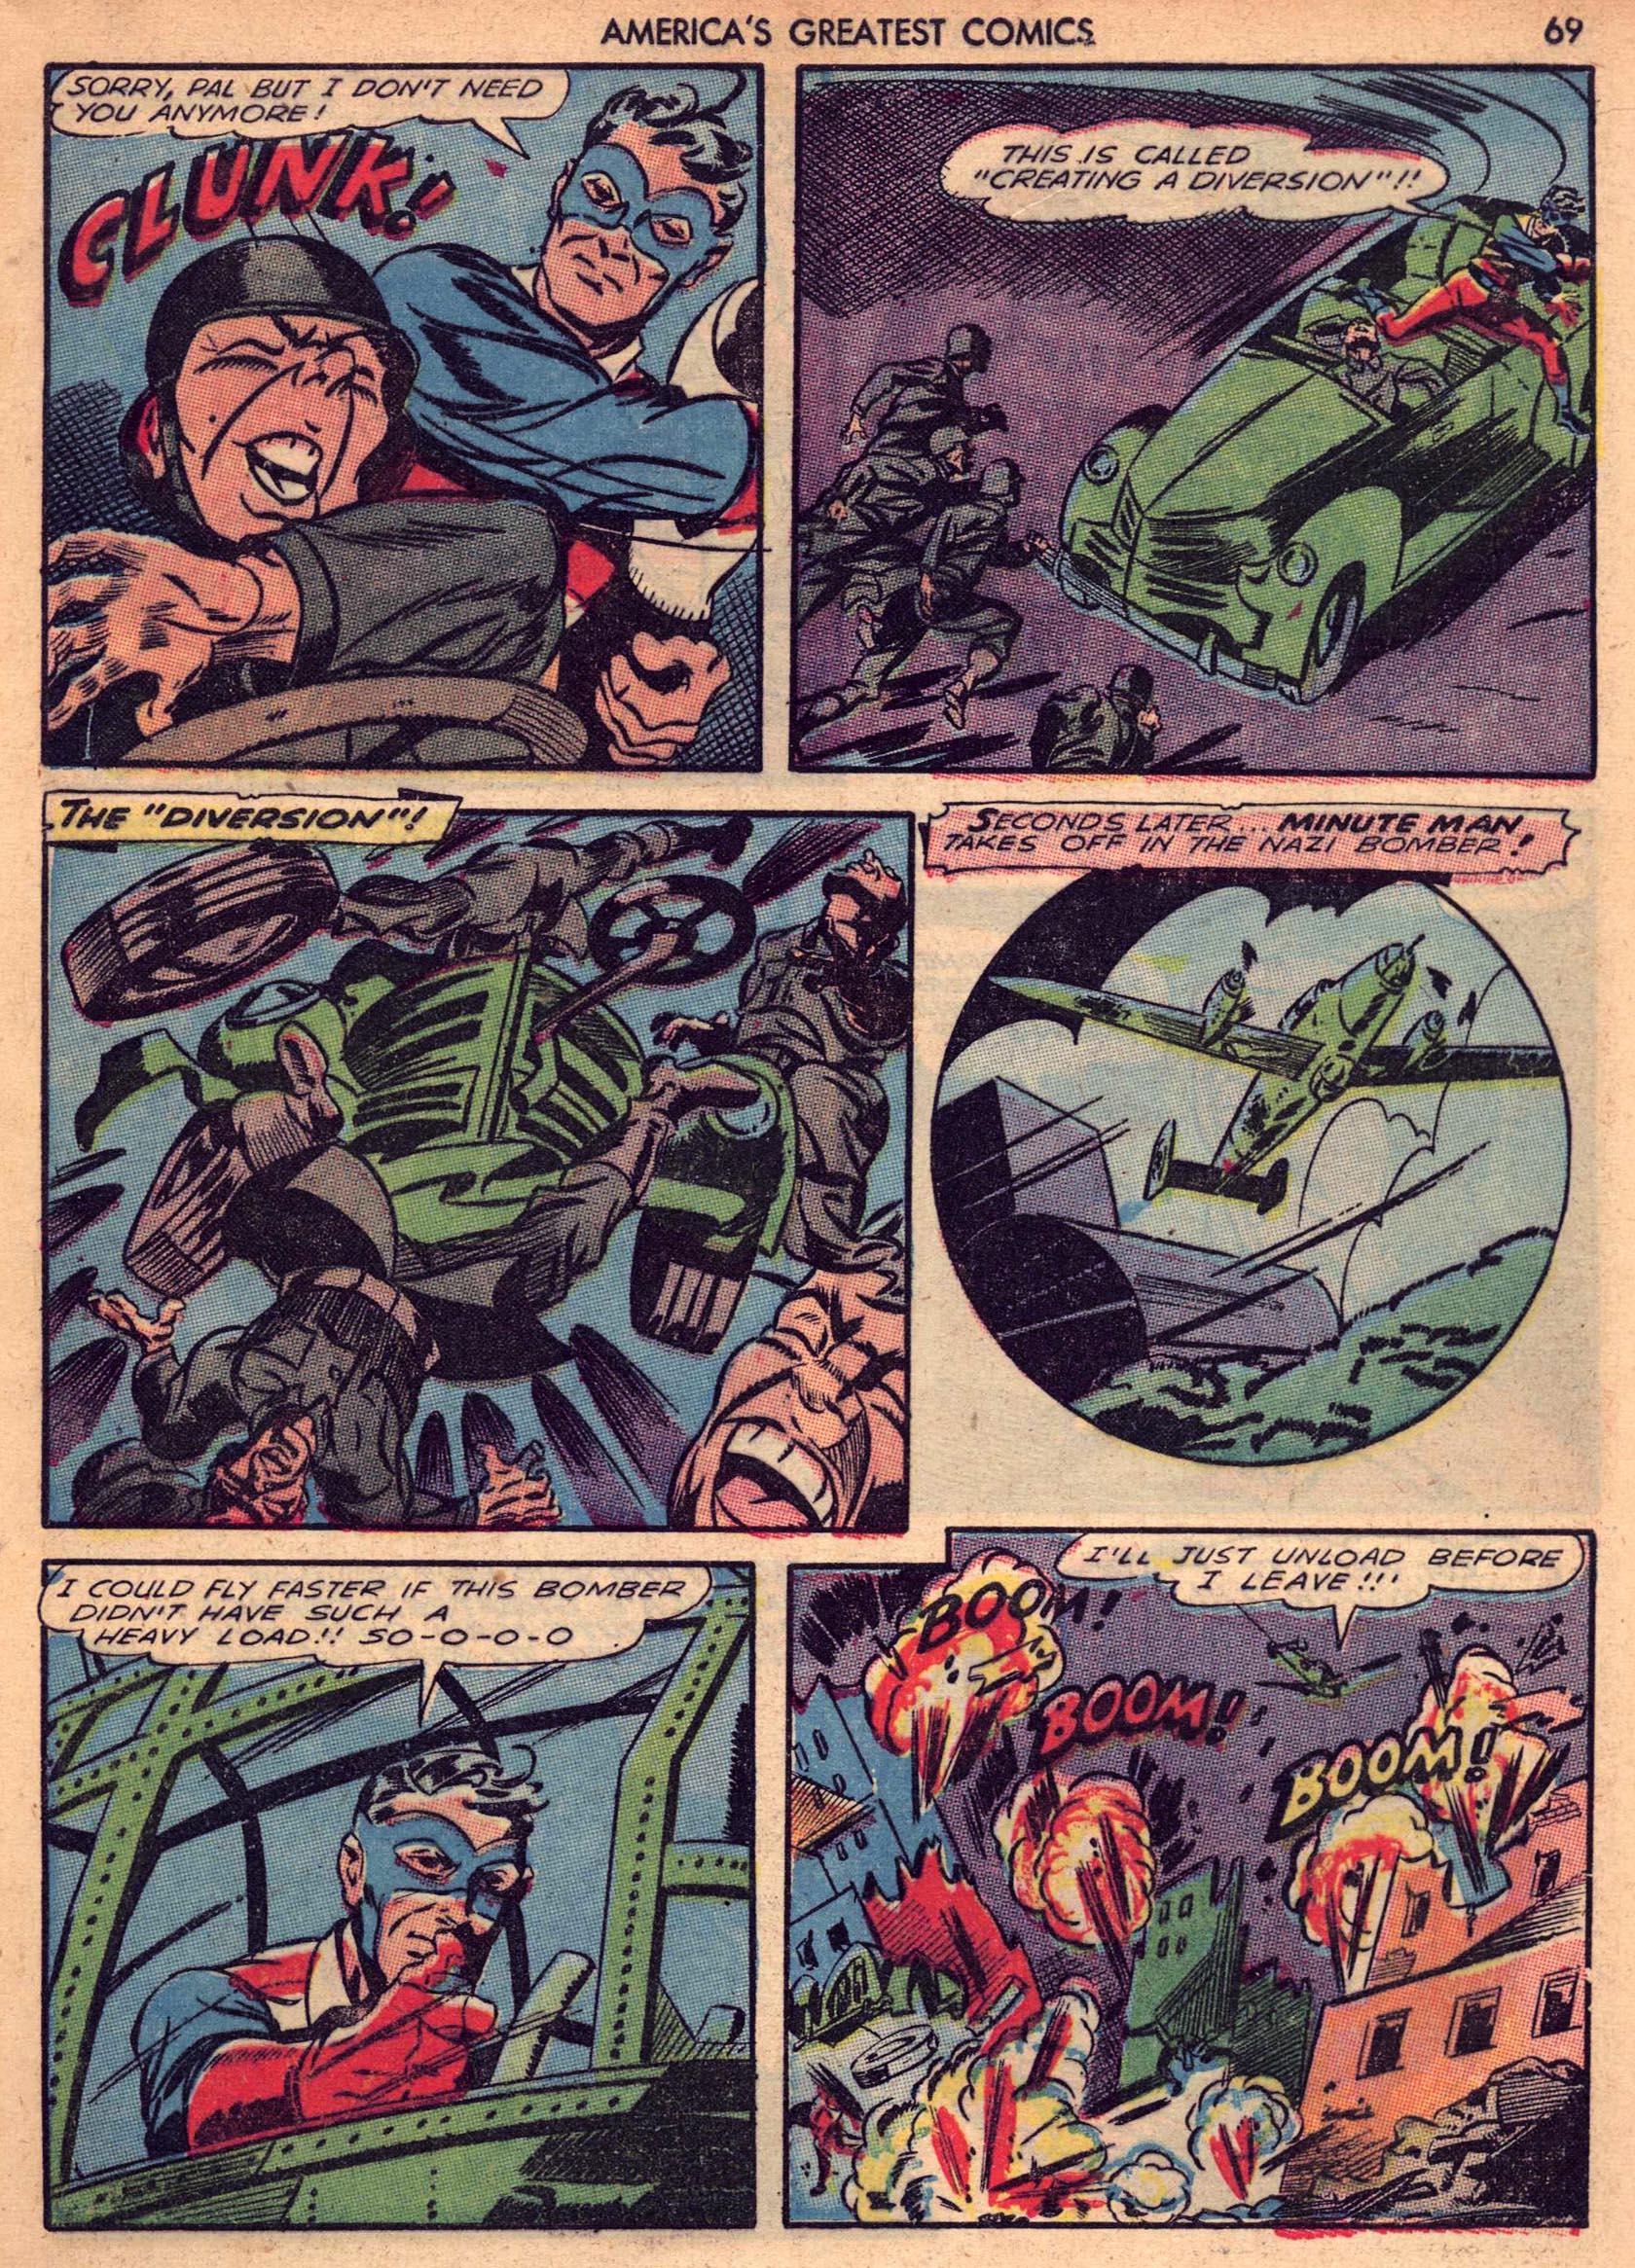 Read online America's Greatest Comics comic -  Issue #7 - 68